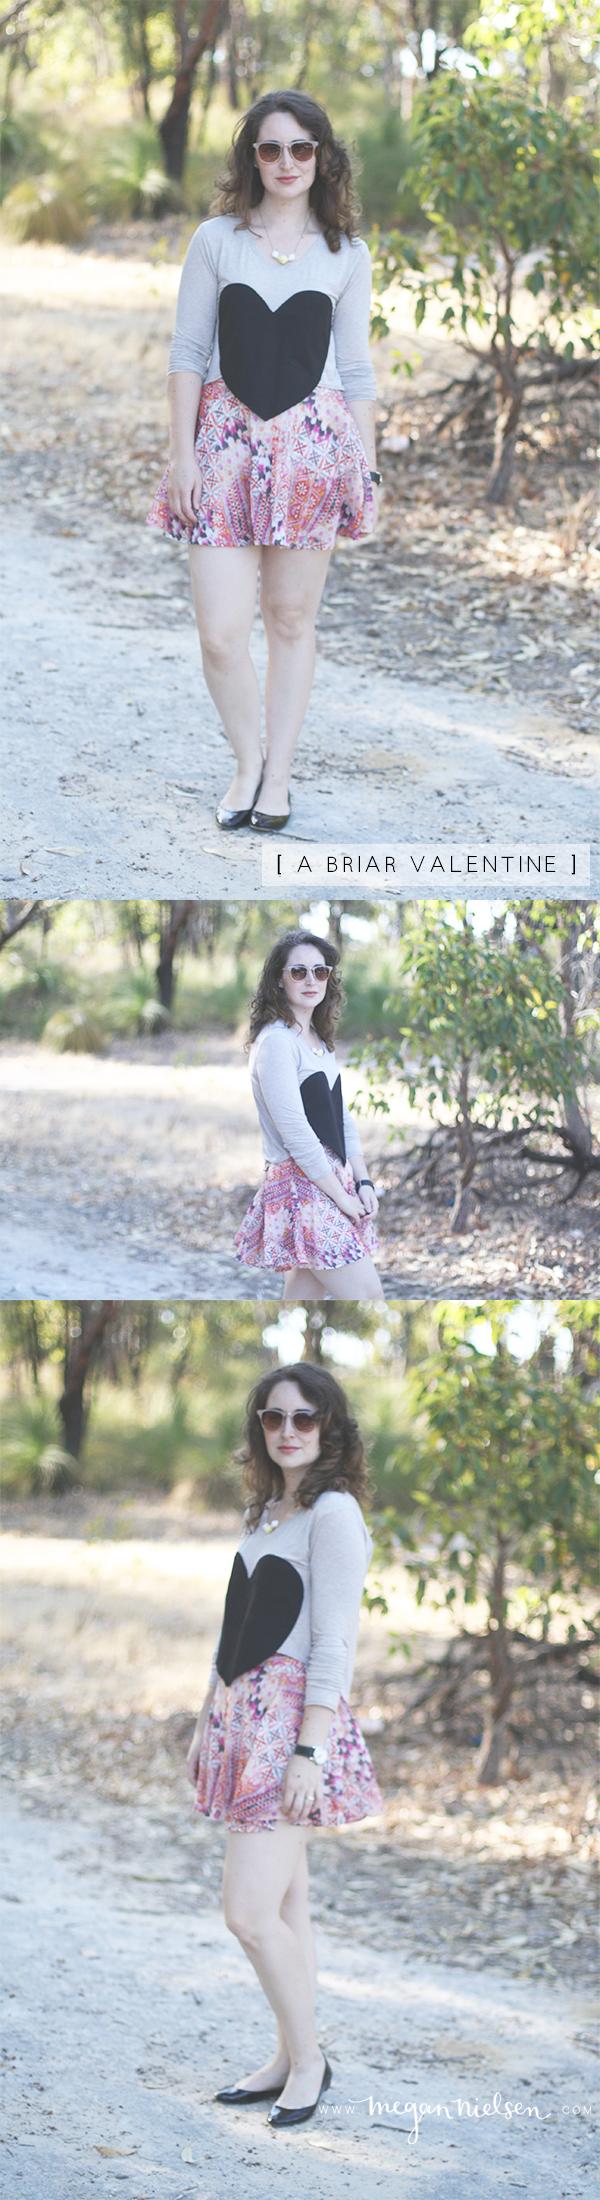 A Valentine Briar // Megan Nielsen